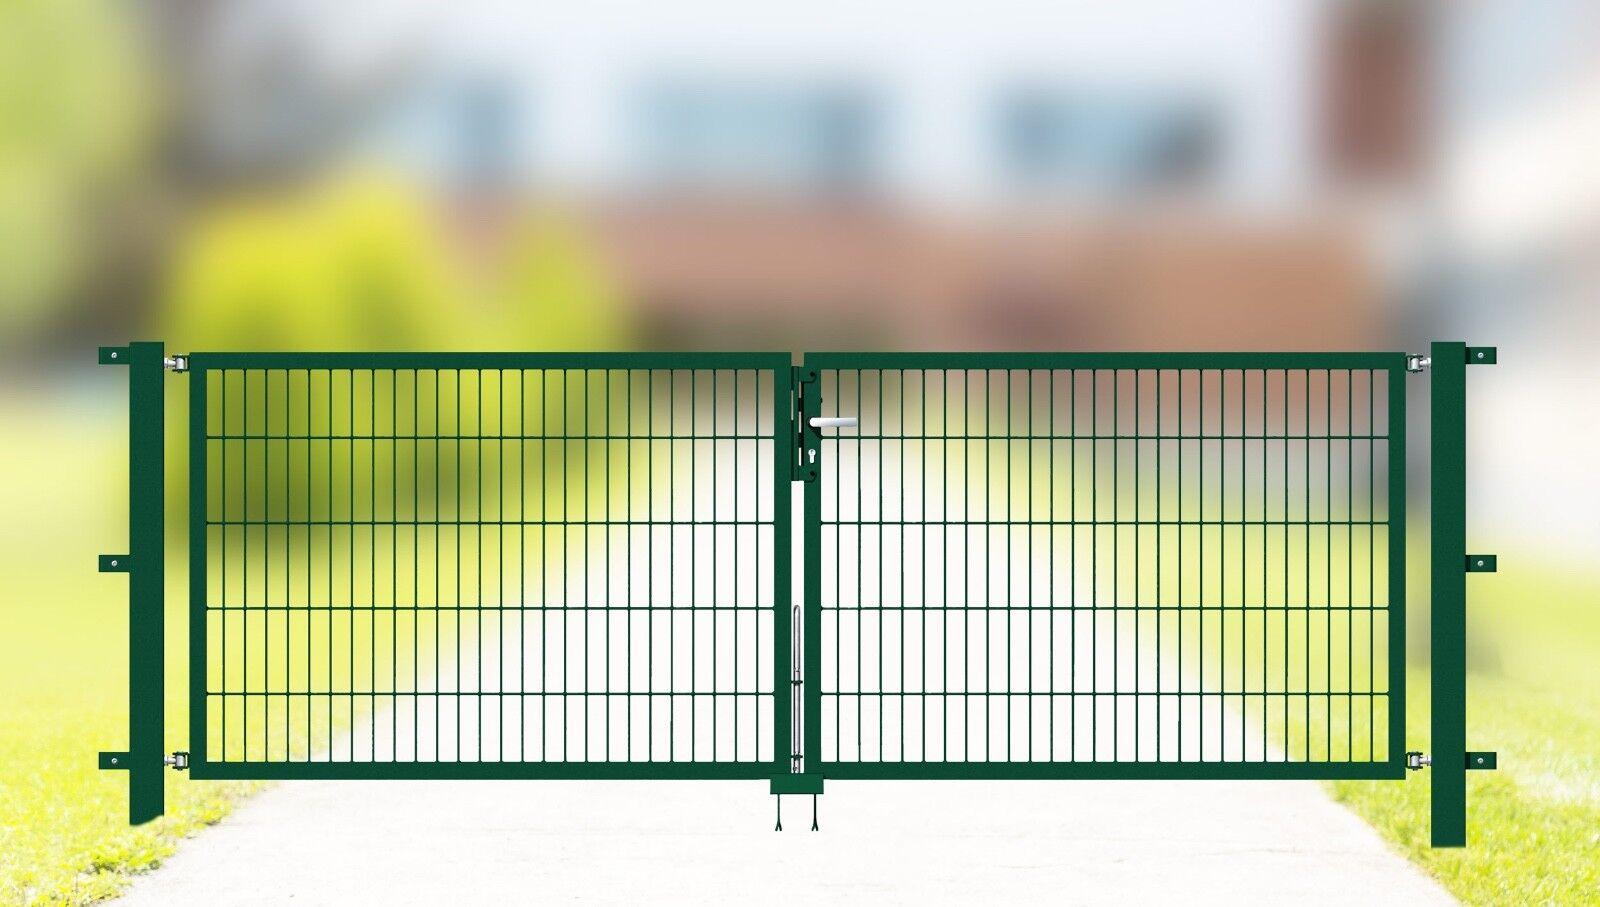 Gartentor Classic, 2-flüglig, grün, 1,0m hoch, 3m breit, Gittertür, Zauntor